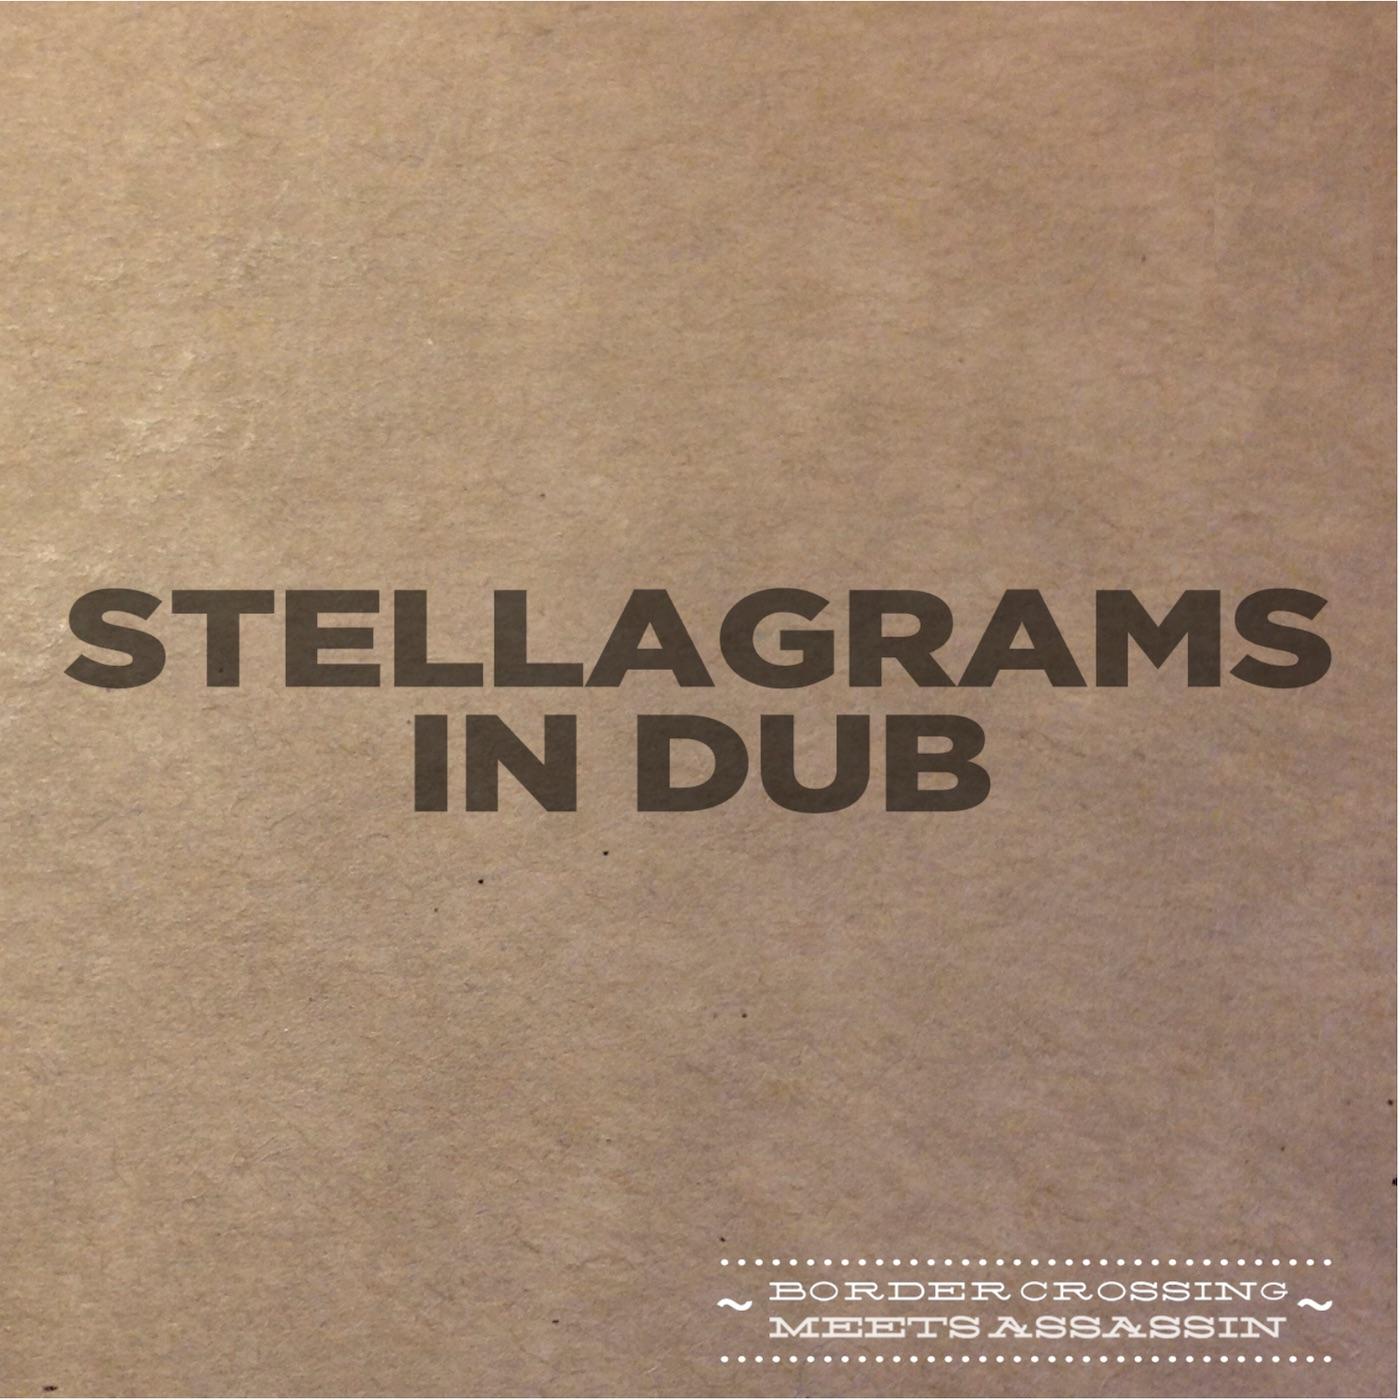 B77013-Stellagrams in Dub.jpg